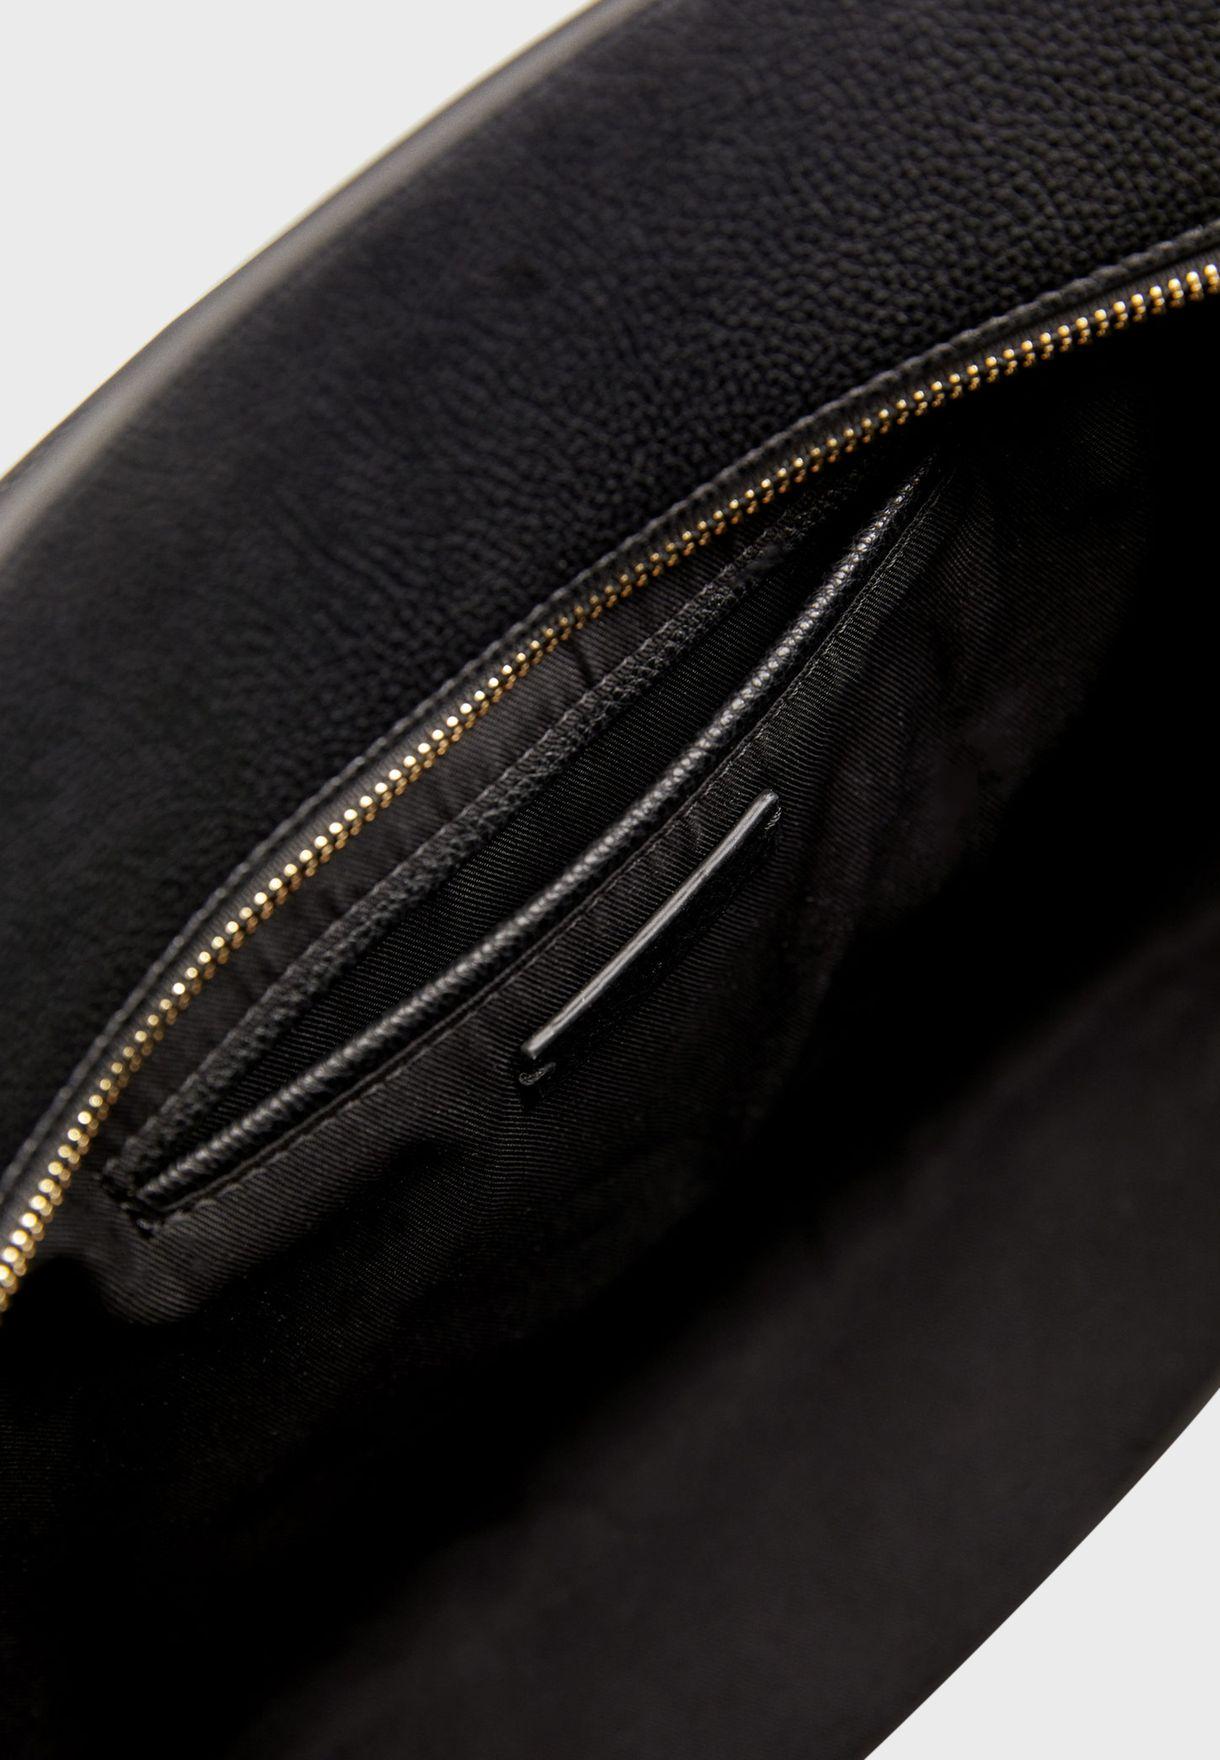 Lucia Inner Zipped Pocket Tote